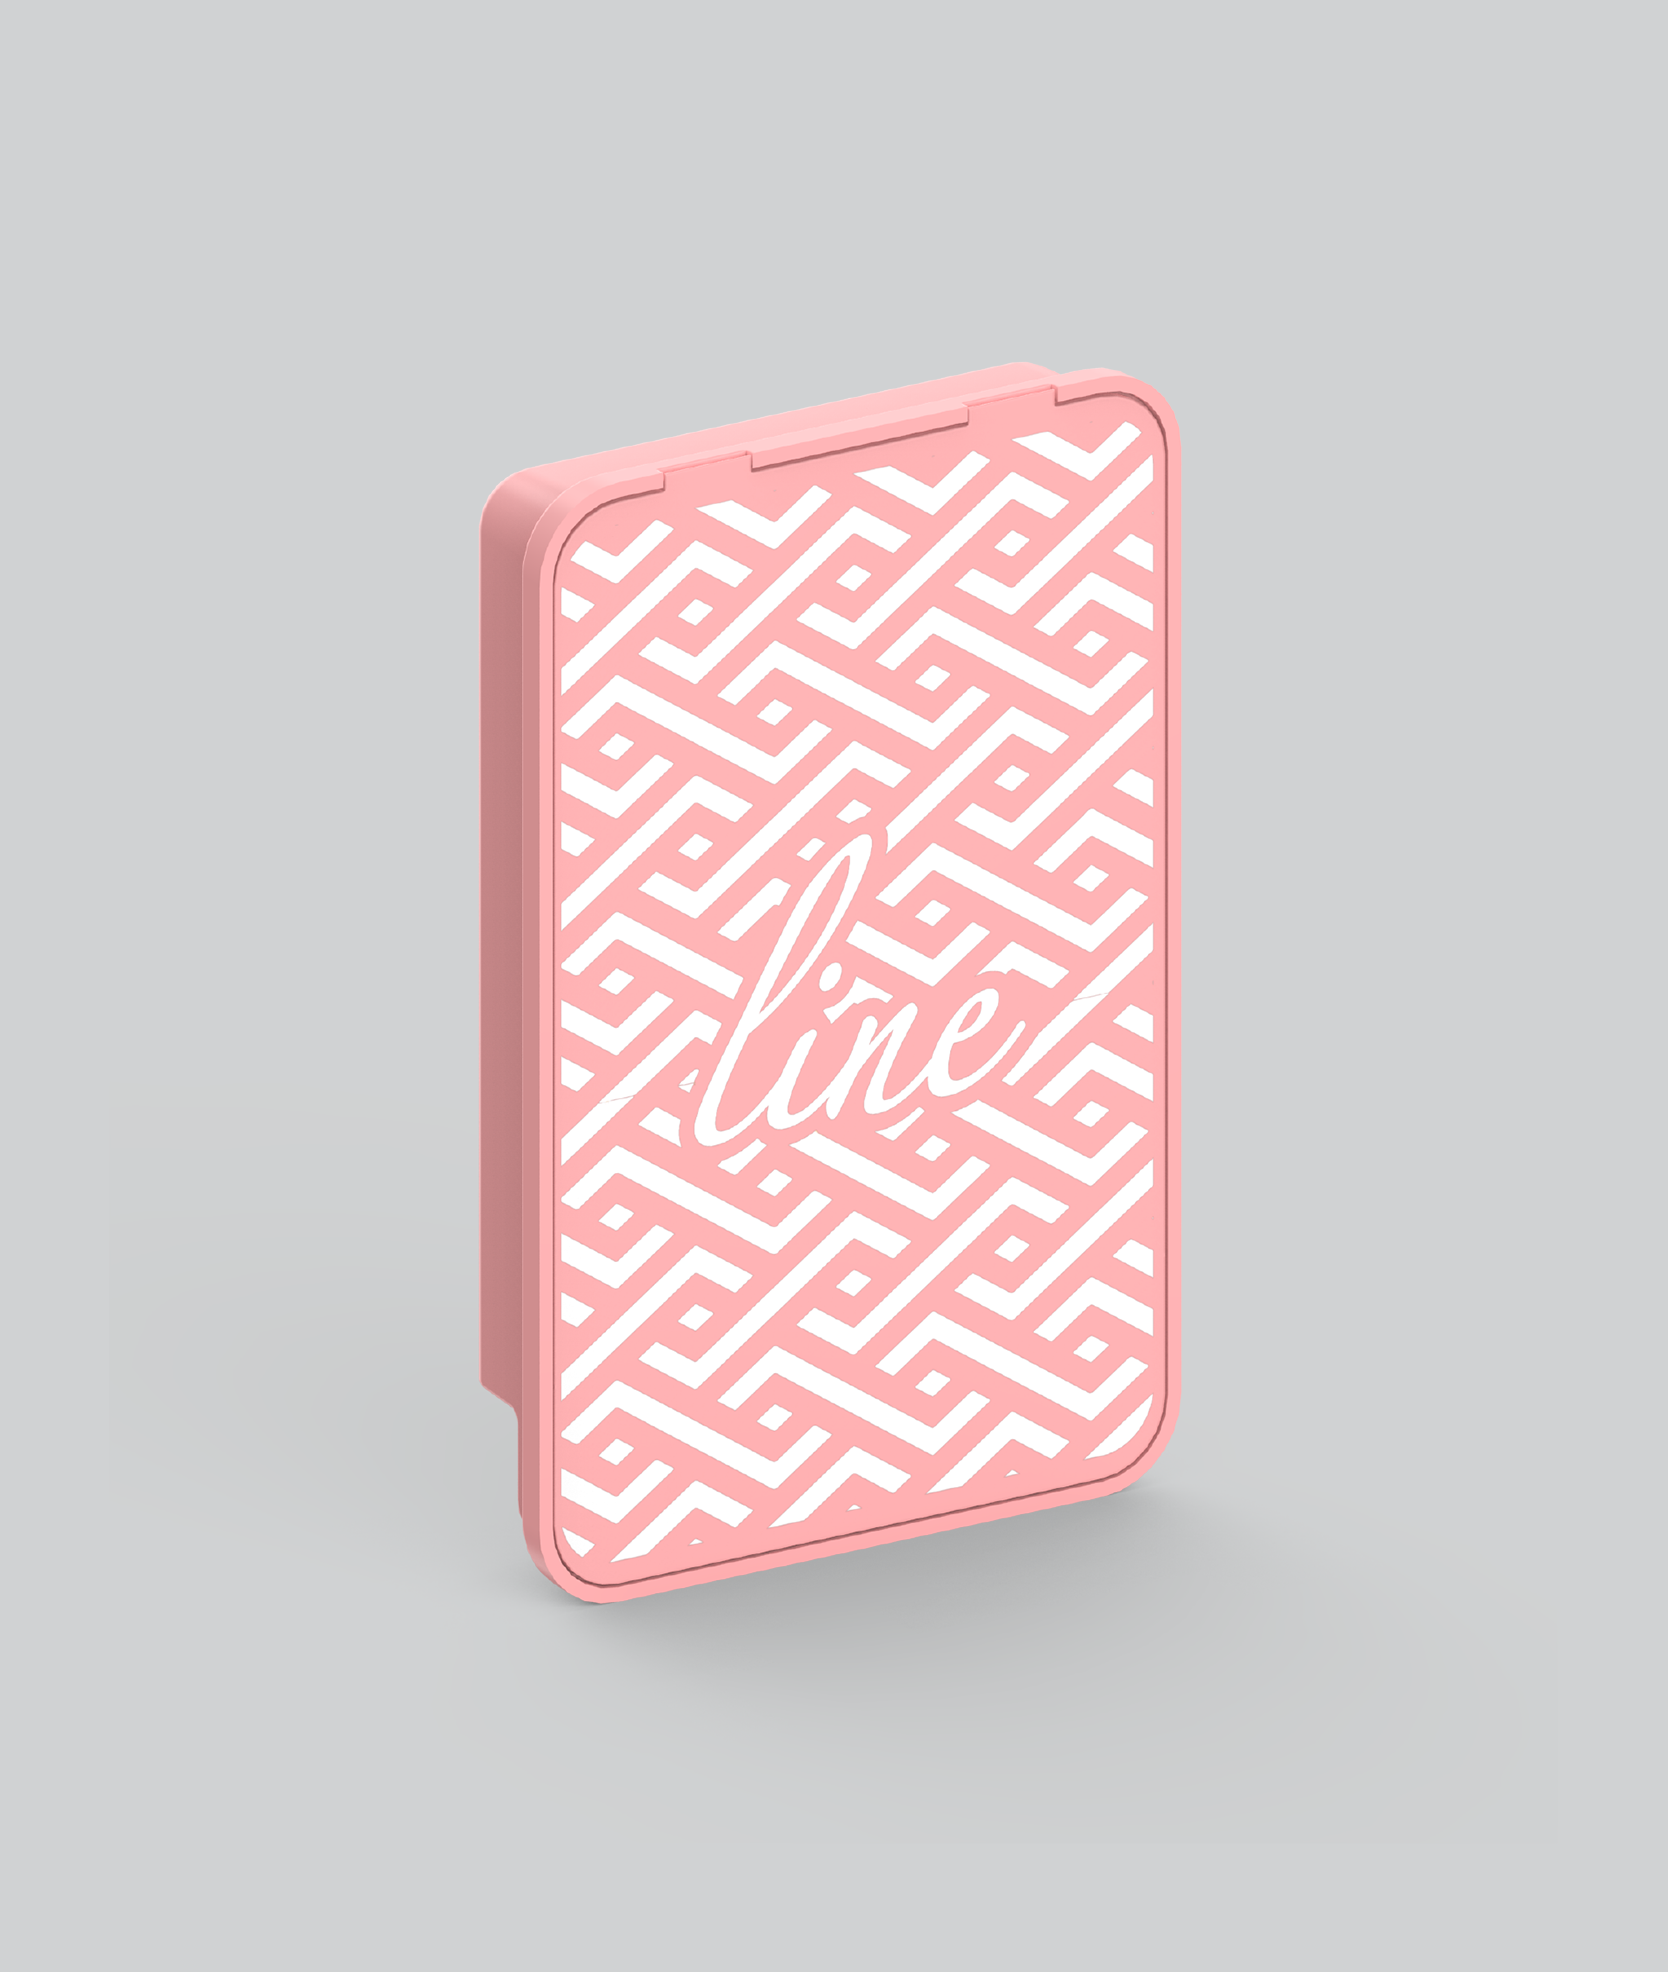 line-custom-snaptech-case-medical-marijuana-packaging